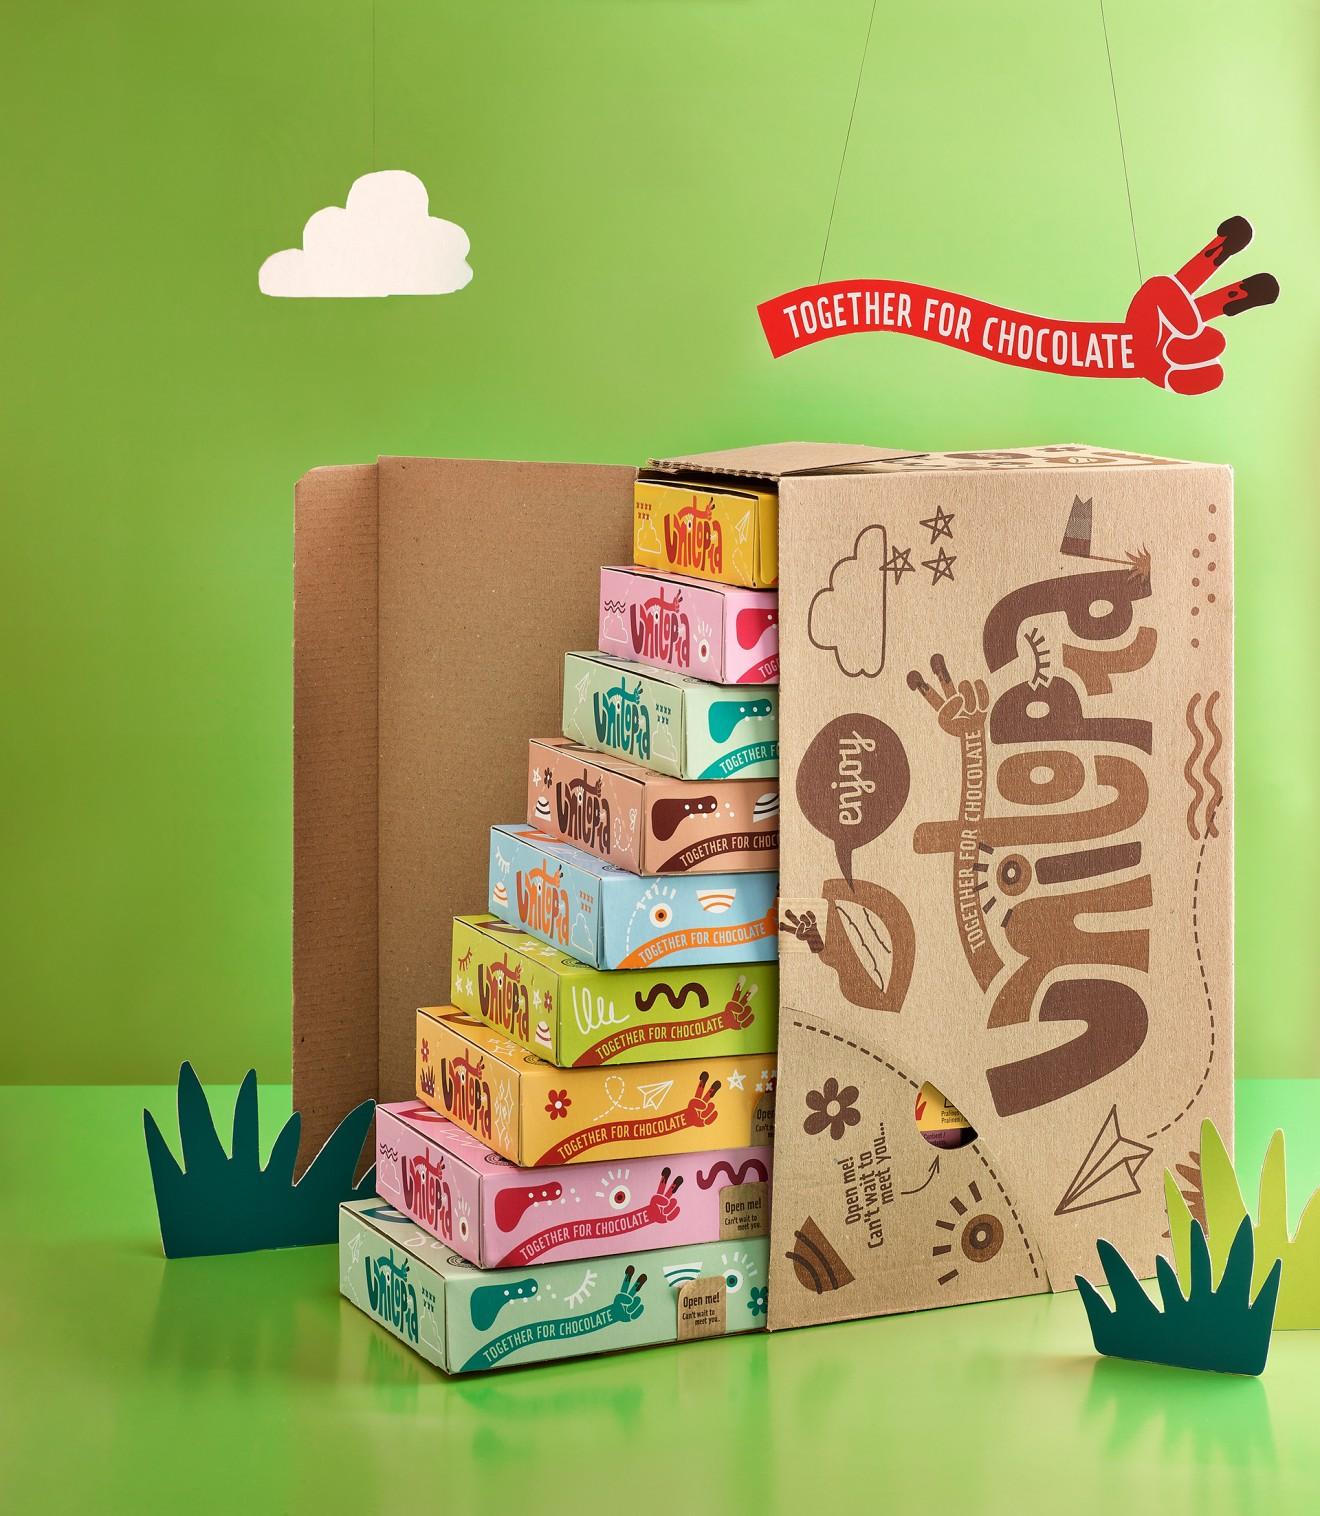 Quatre Mains package design - unboxing, fairtrade, quatre mains